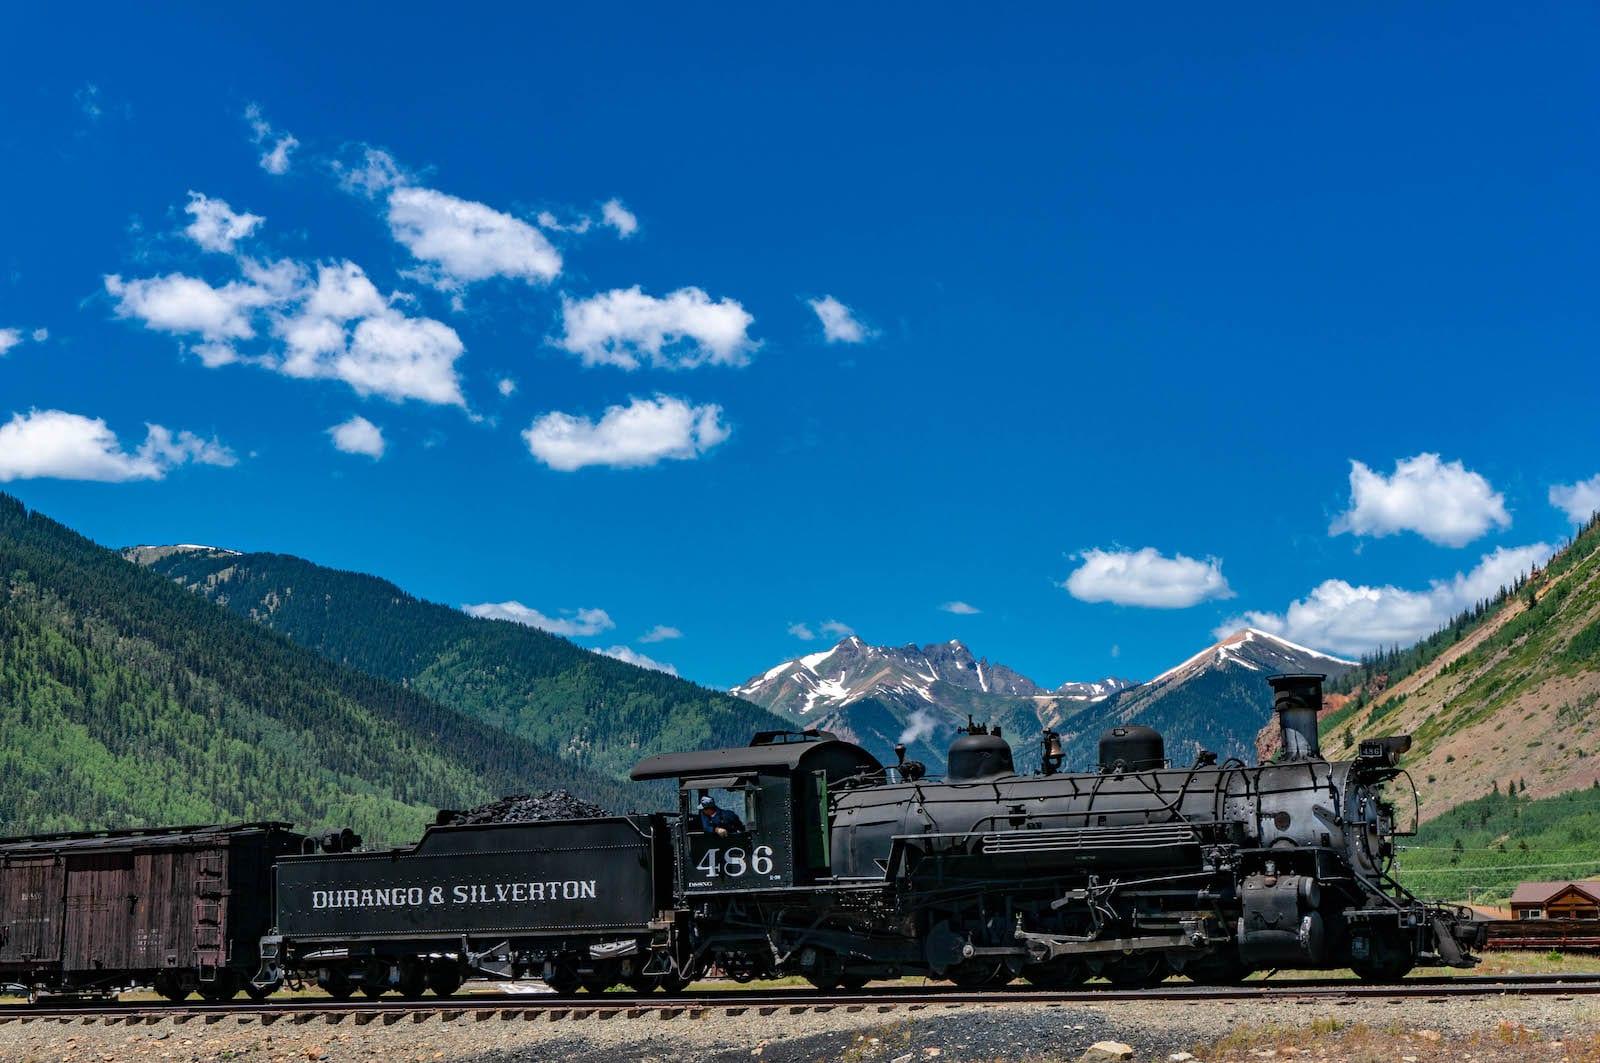 Durango-Silverton train, CO